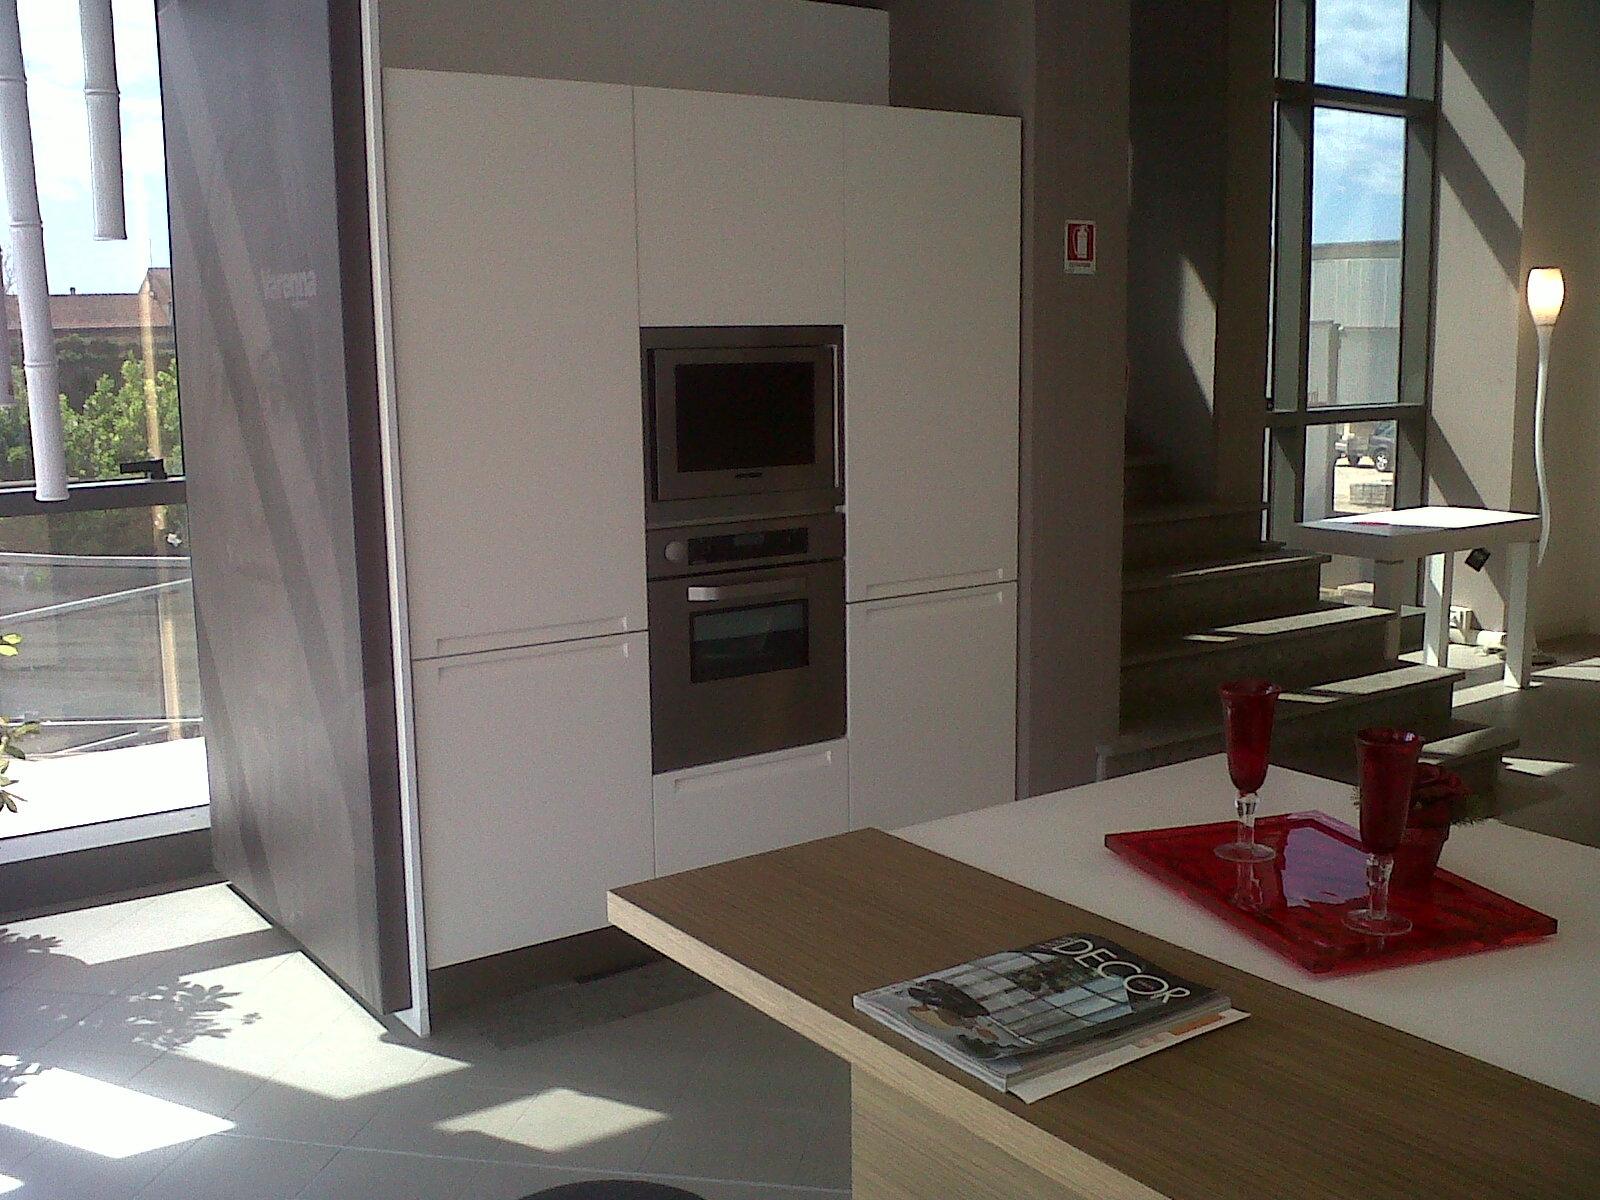 Cucina Minimal Varenna : Cucina varenna minimal design cucine a prezzi scontati